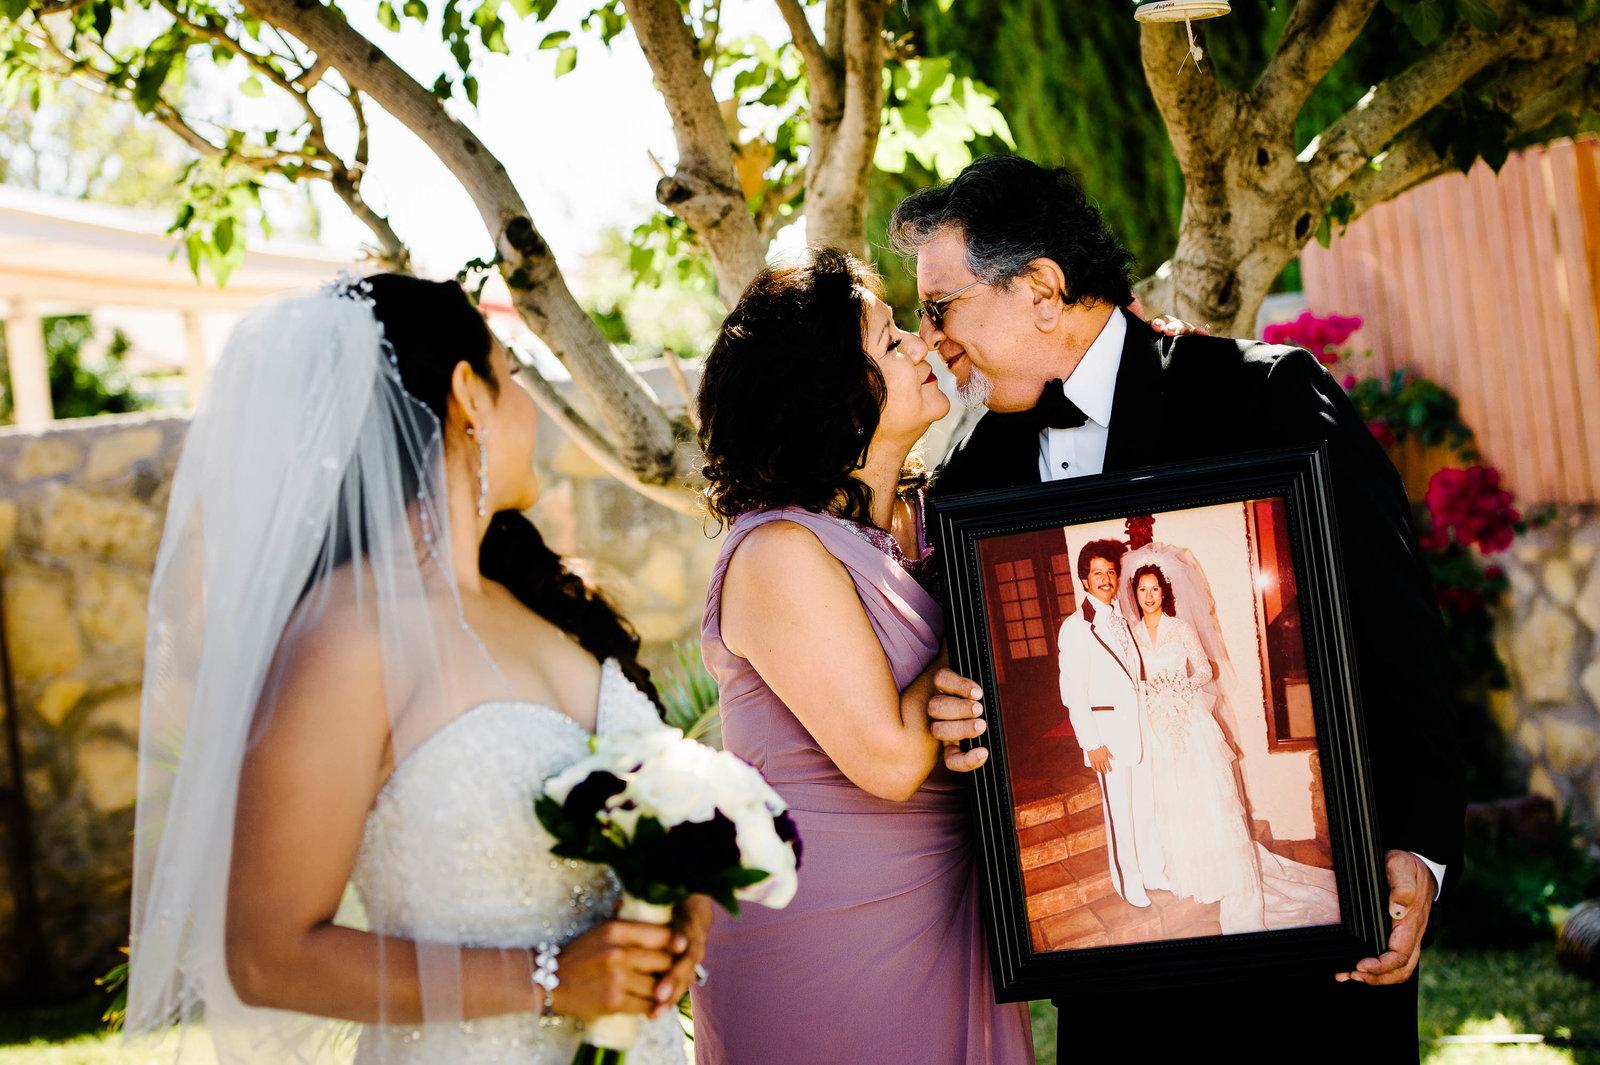 161-El-paso-wedding-photographer-El Paso Wedding Photographer_M50